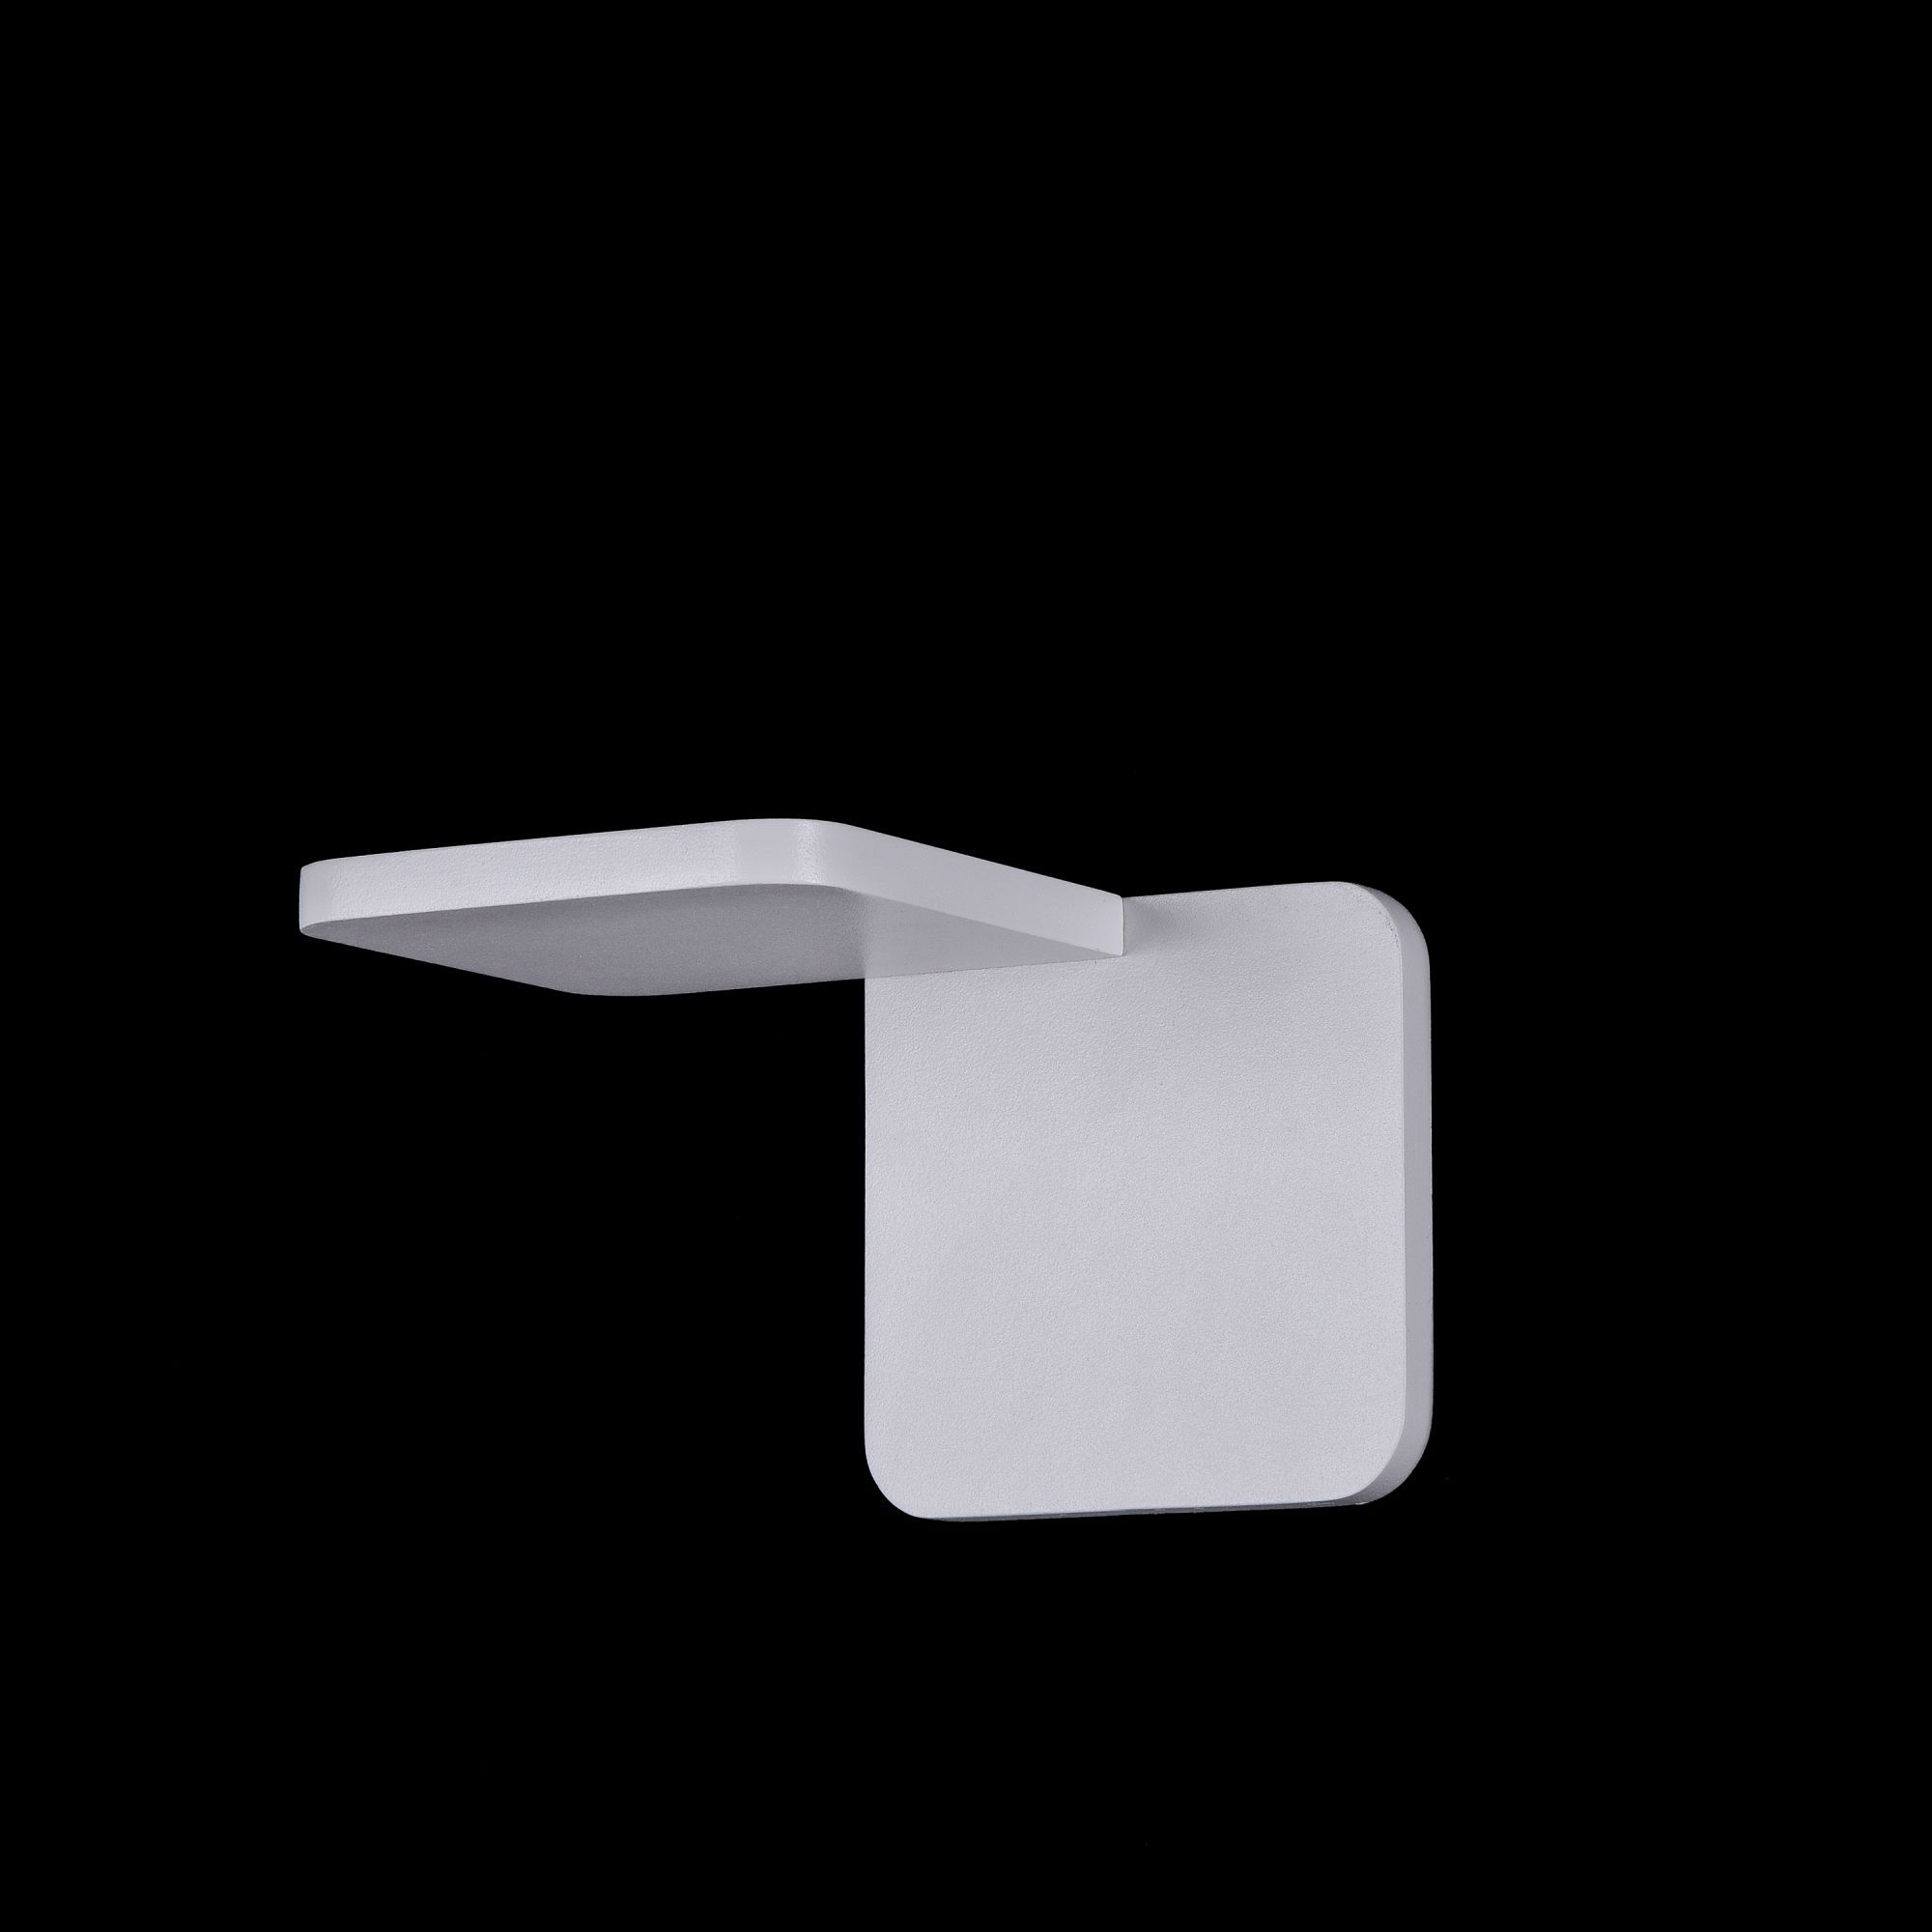 Настенный светодиодный светильник Maytoni Trame C807WL-L7W, LED SMD 2835 7W 3000K 350lm CRI84, белый, металл, стекло - фото 2